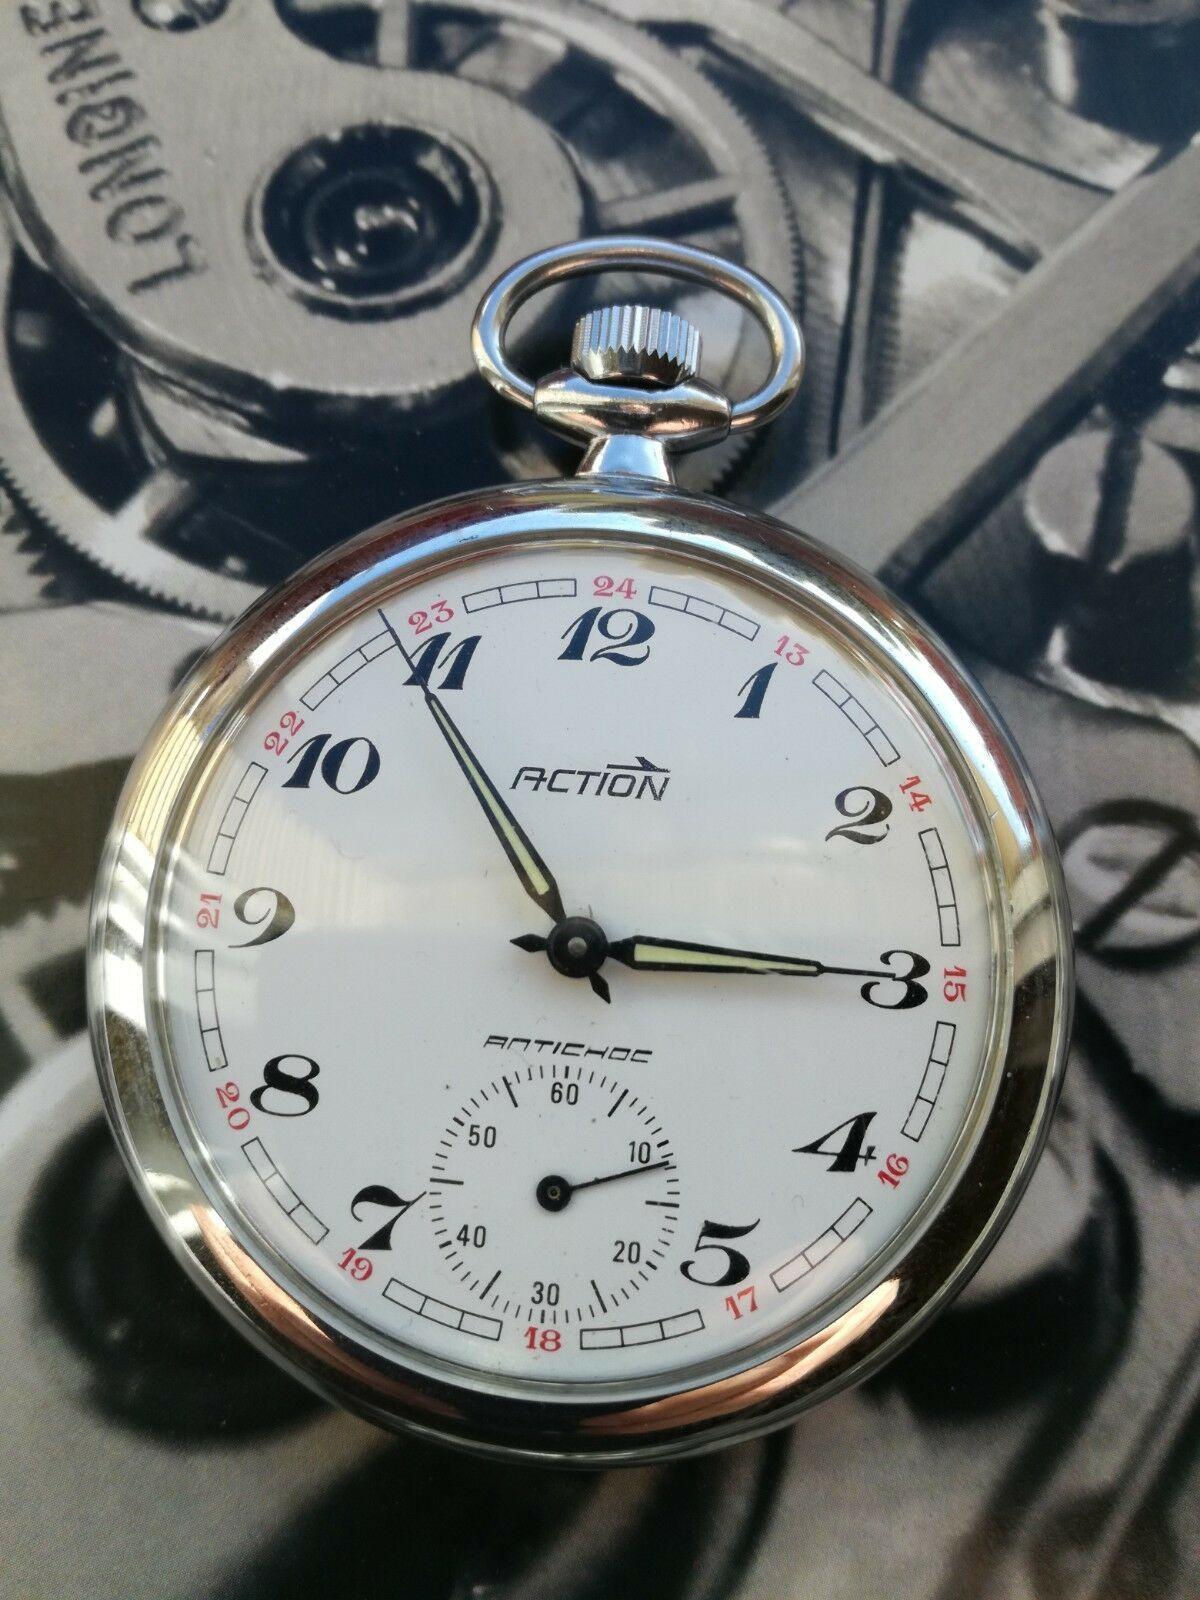 Reloj 00€Relojes De Bolsillo Marca Action 60 • Antiguo UMpqVSz